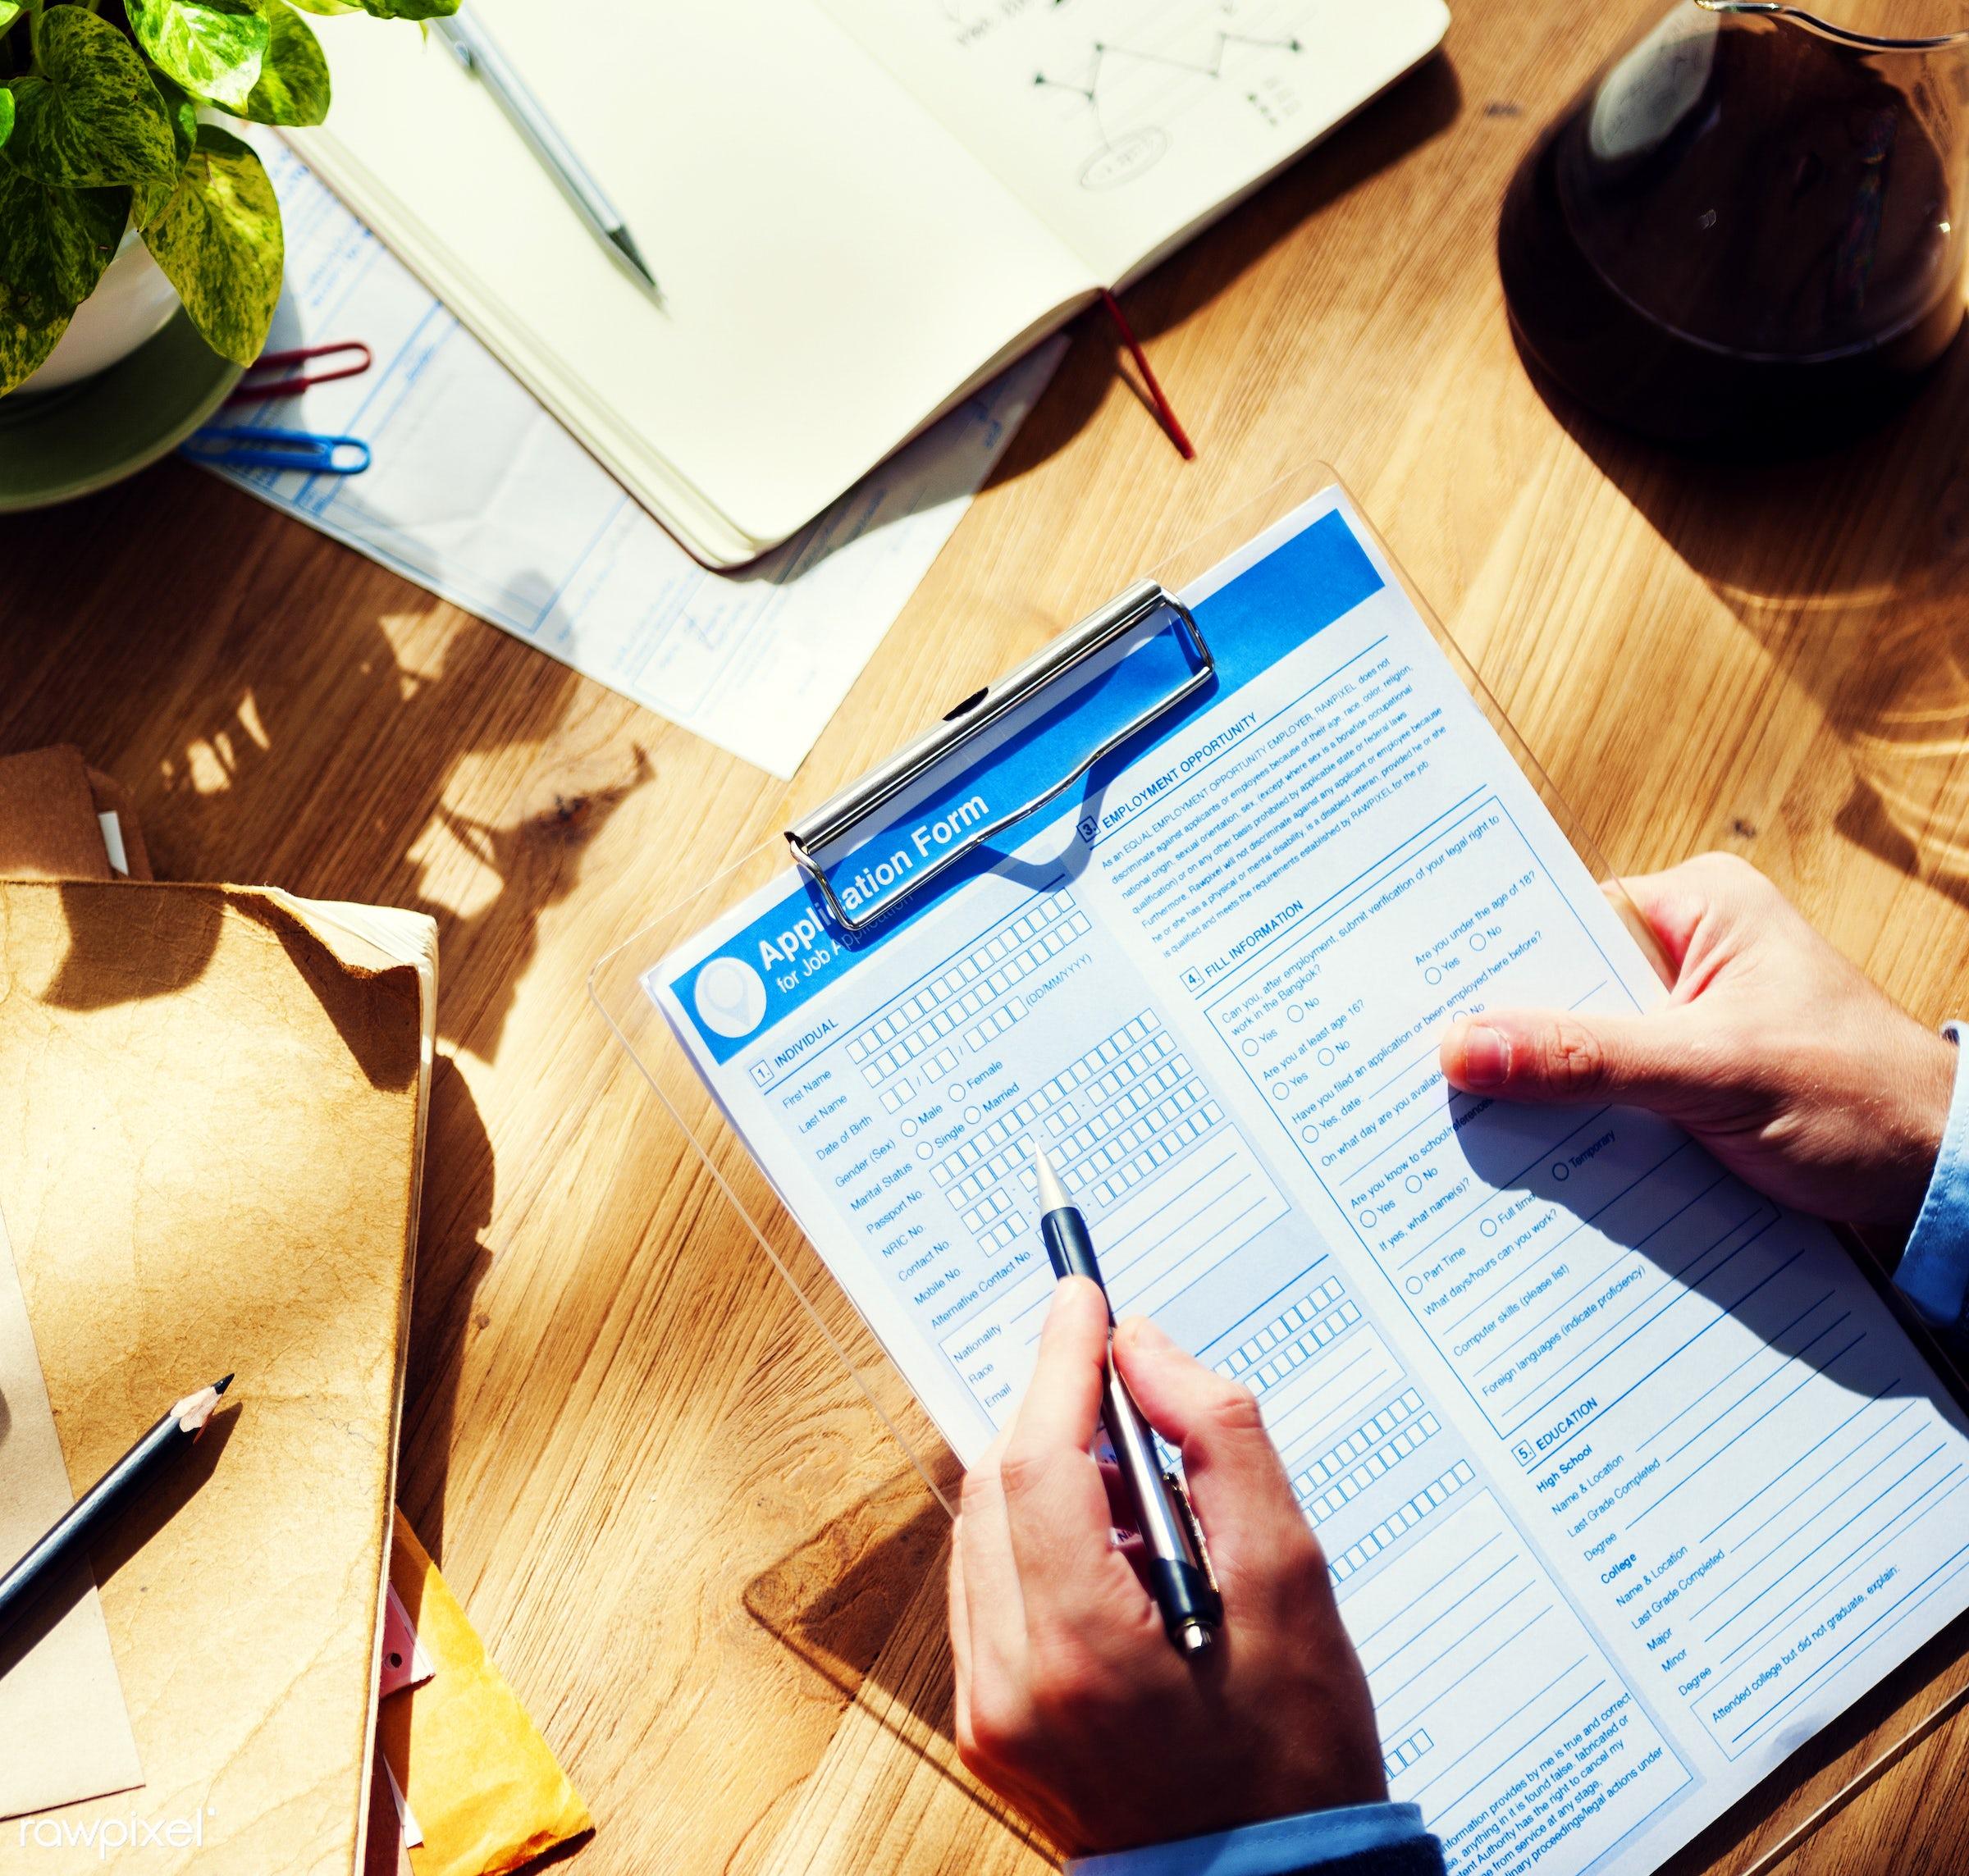 contemporary, holding, applicant, application, application form, applying, business, calendar, corporate, desk, desktop,...